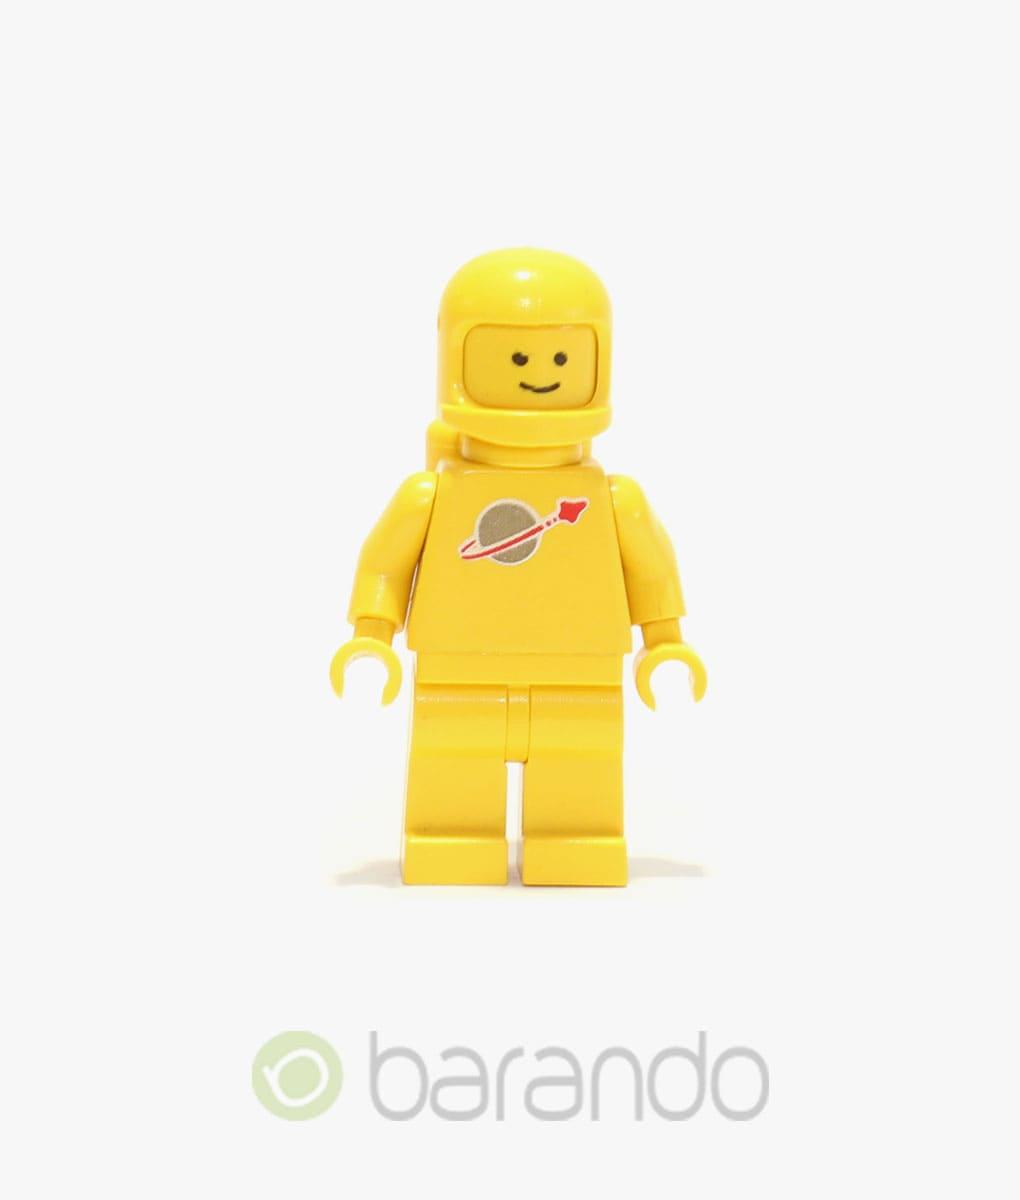 Lego Classic Space Yellow Sp007 Online Kaufen Barando